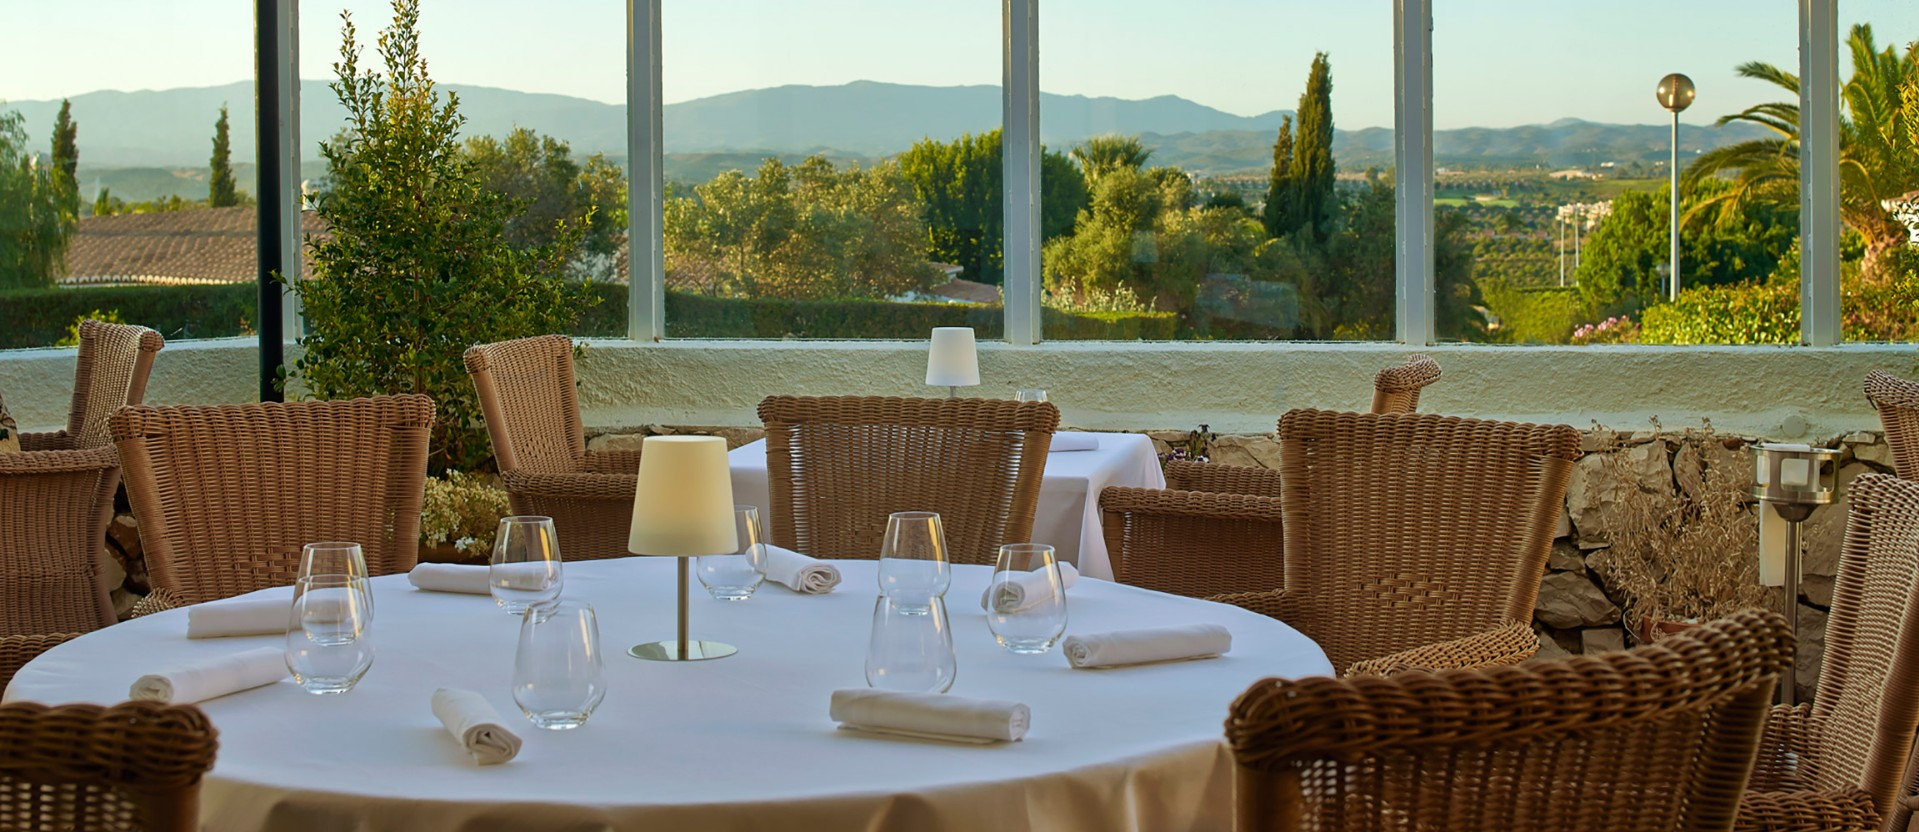 Michelin star restaurants: Bon Bon michelin star restaurants Michelin star restaurants: The complete guide for 2019 image 1